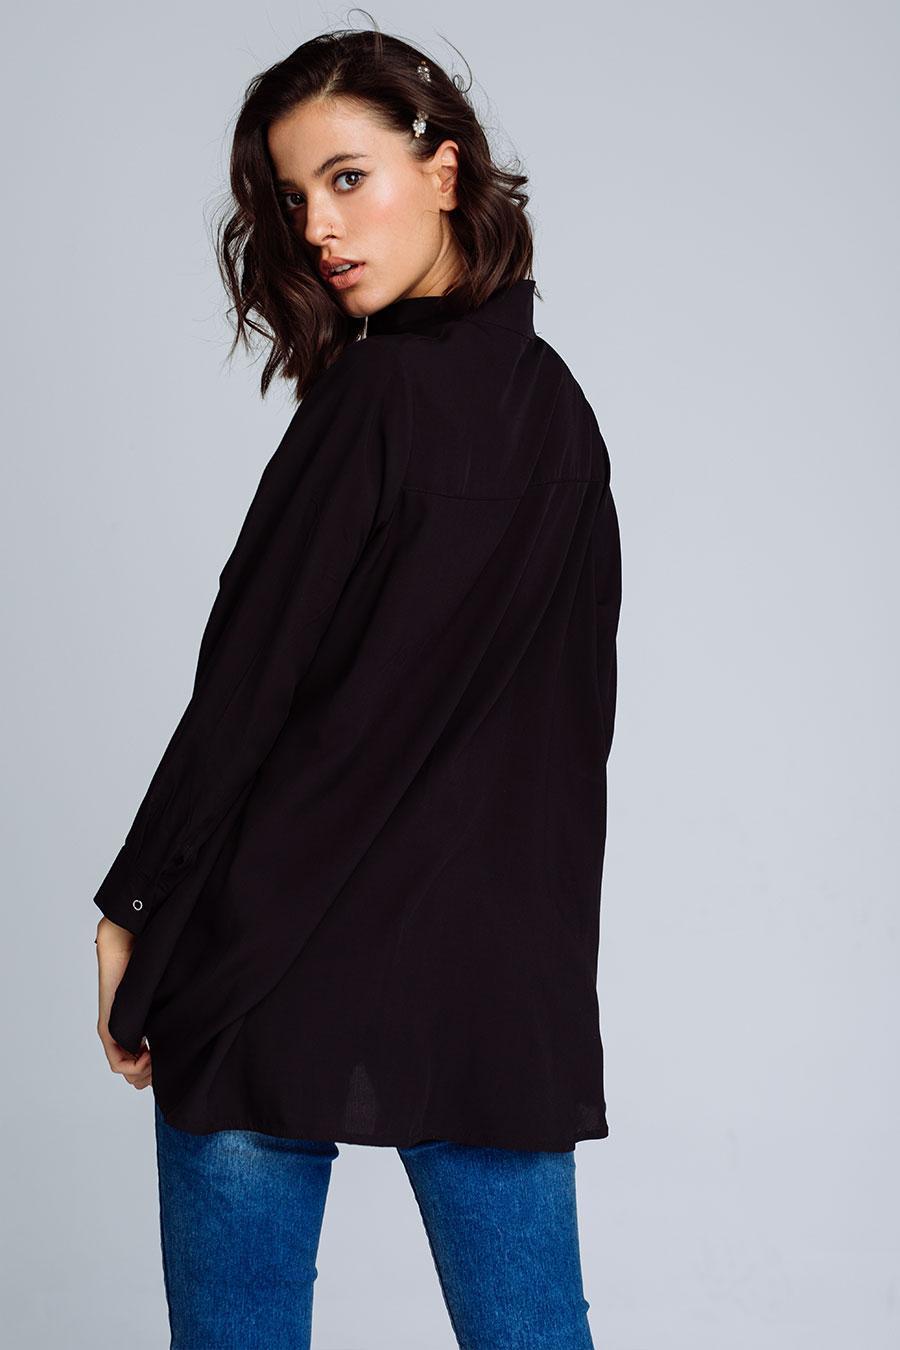 Online Shop Jagger Zenska Kosulja Jg 9258 01 Kolekcija Jesen Zima 2020 2021 02